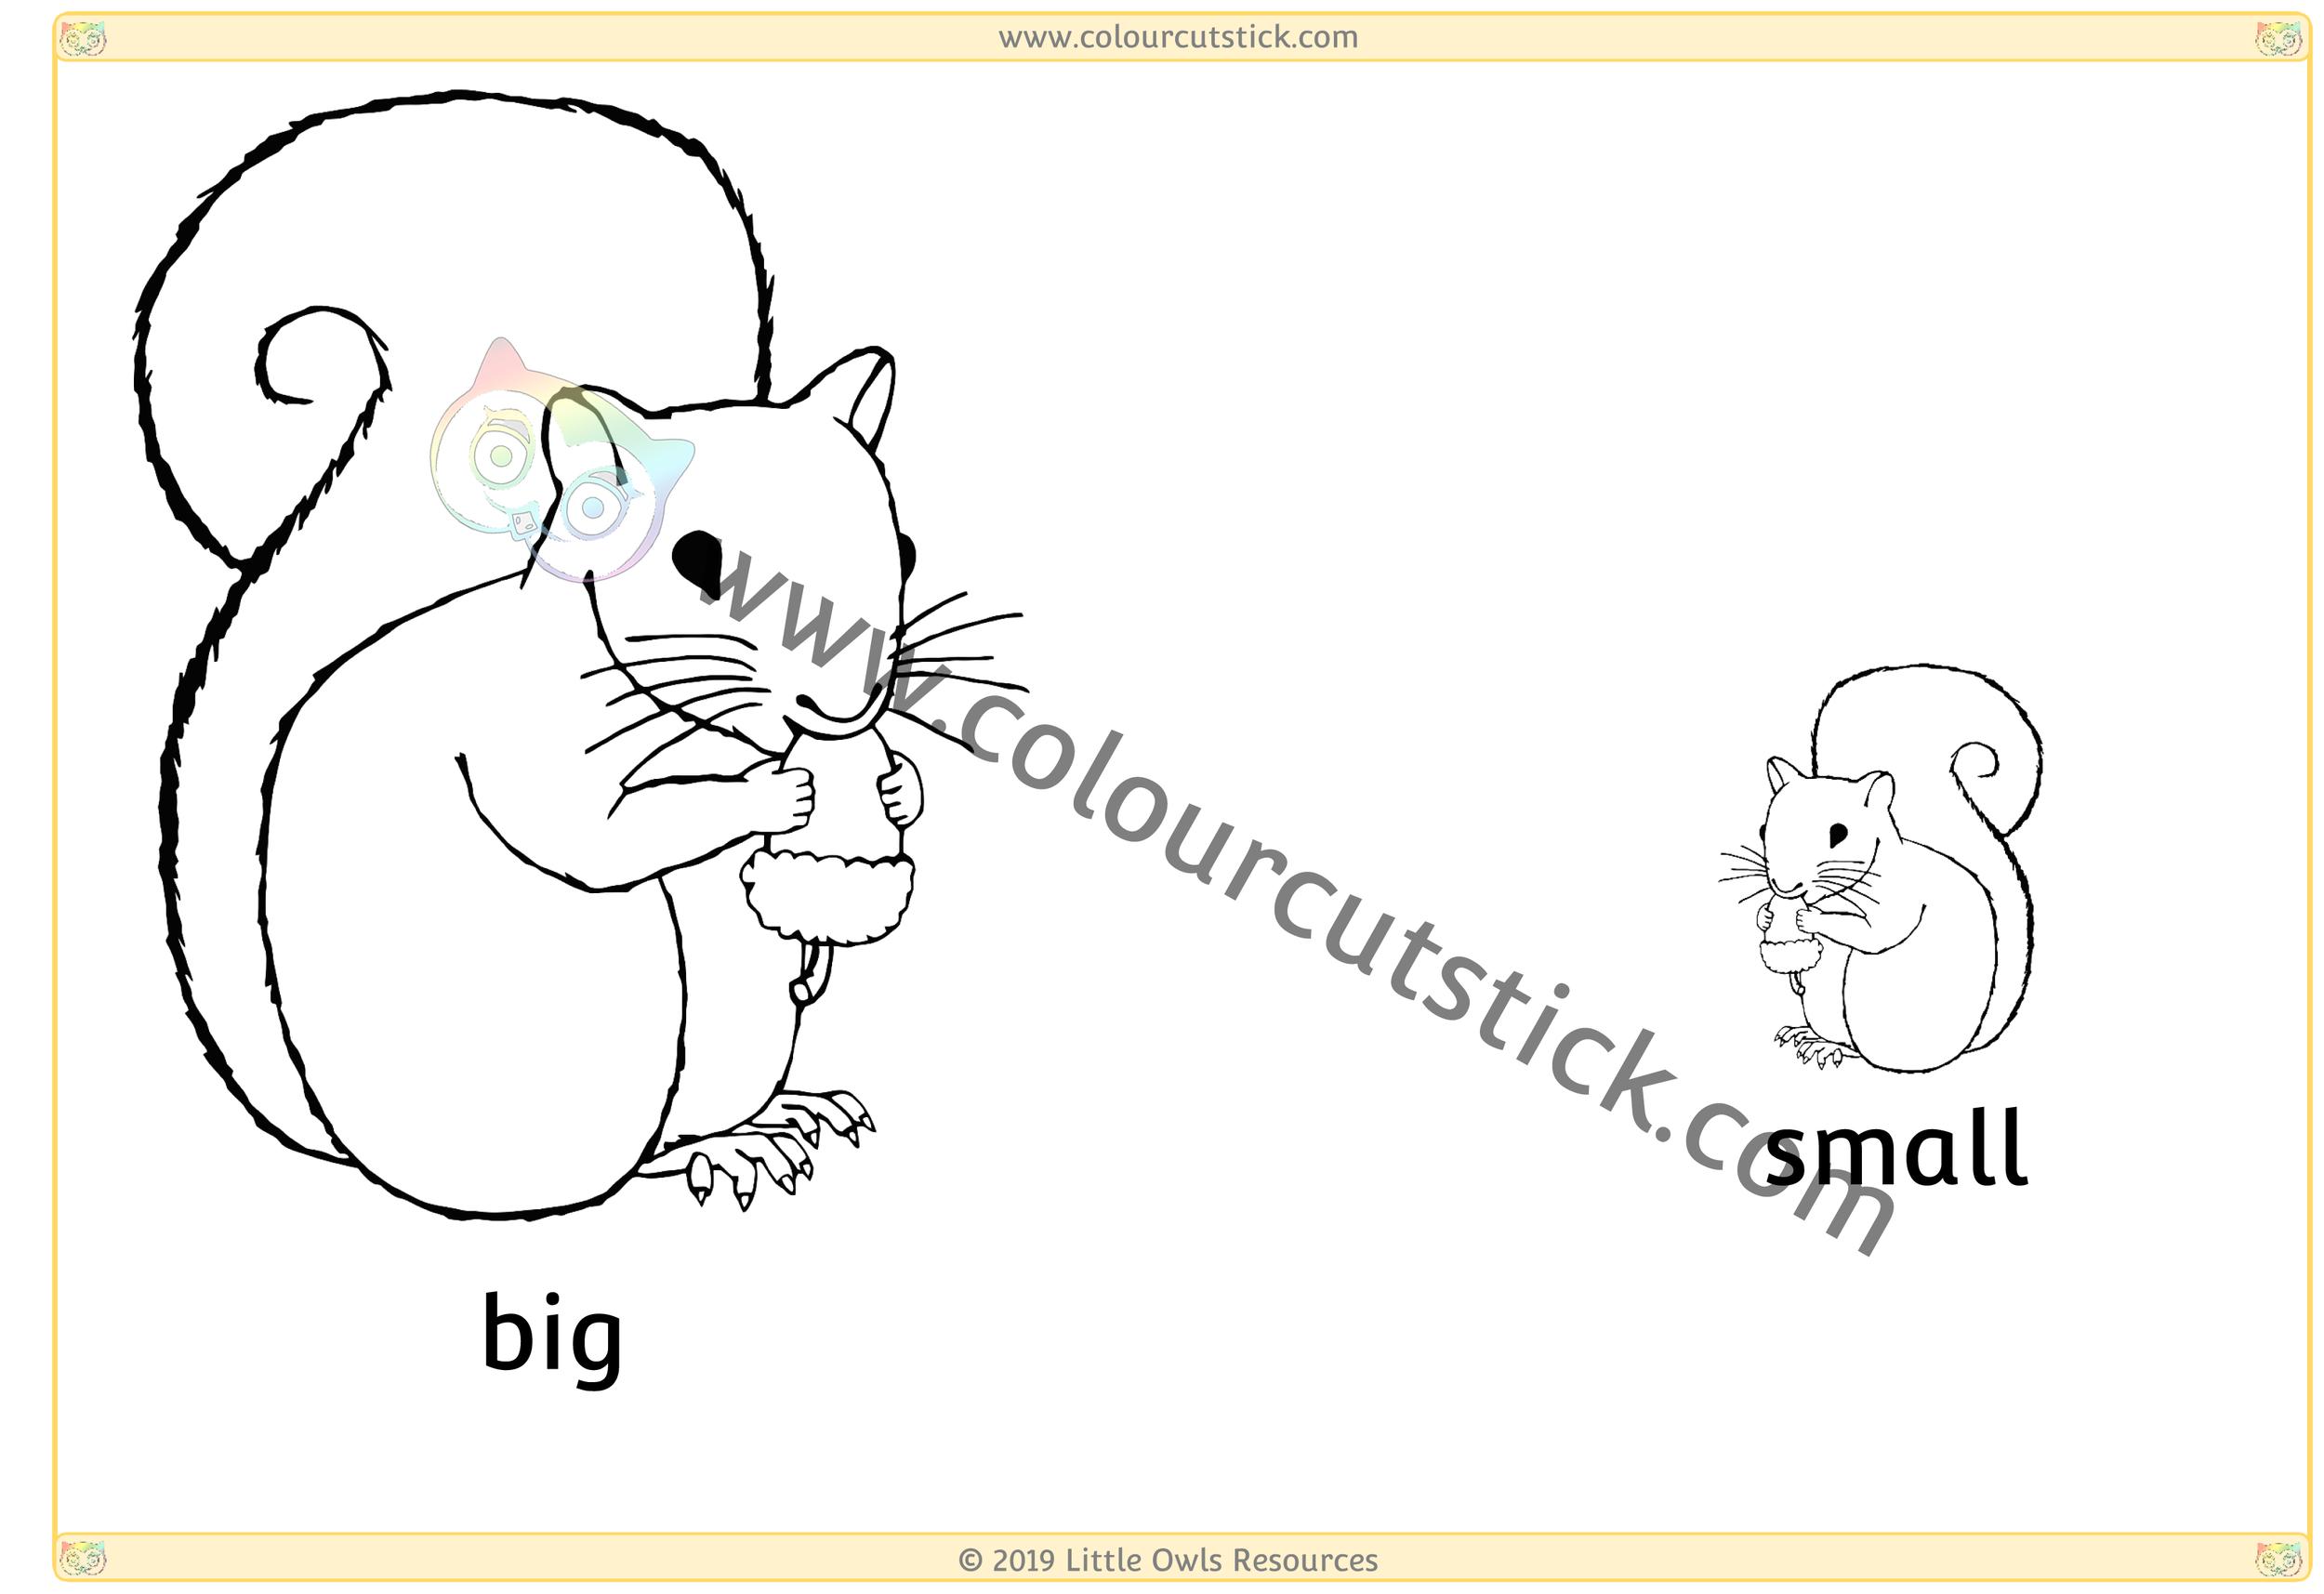 Squirrel - Big/Small -